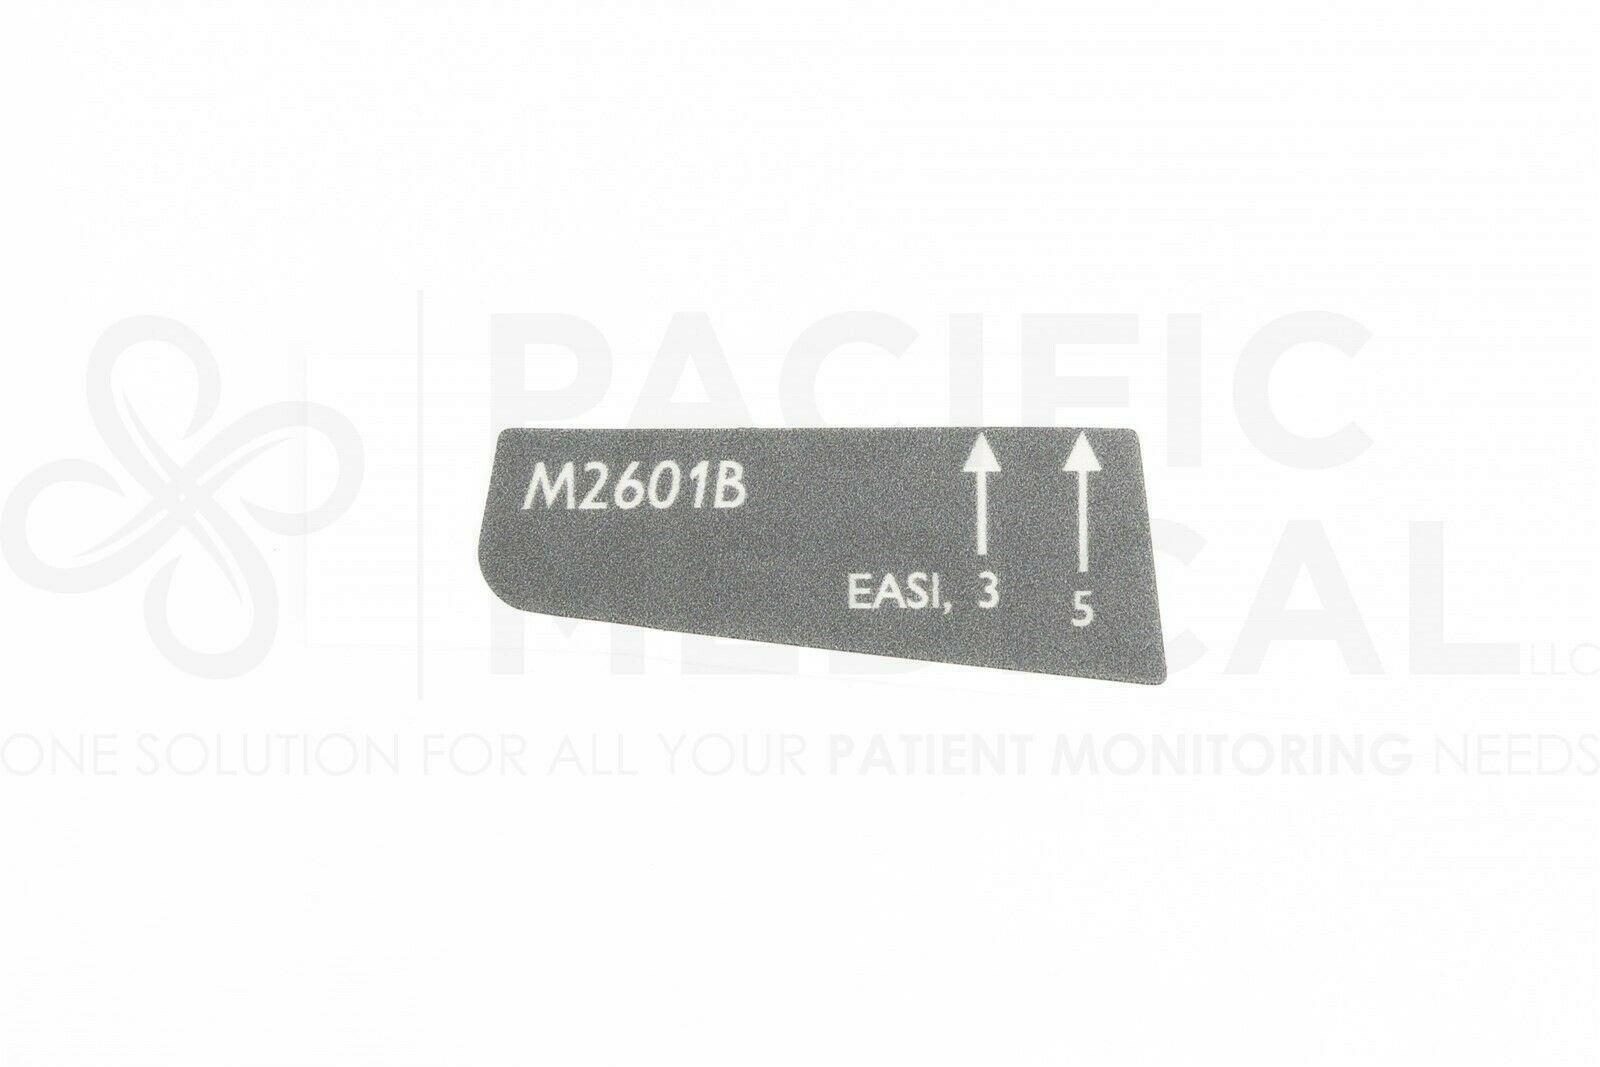 Philips IntelliVue M2601B Tele Transmitter S01 S02 S03 ECG Lead Wire Overlay New